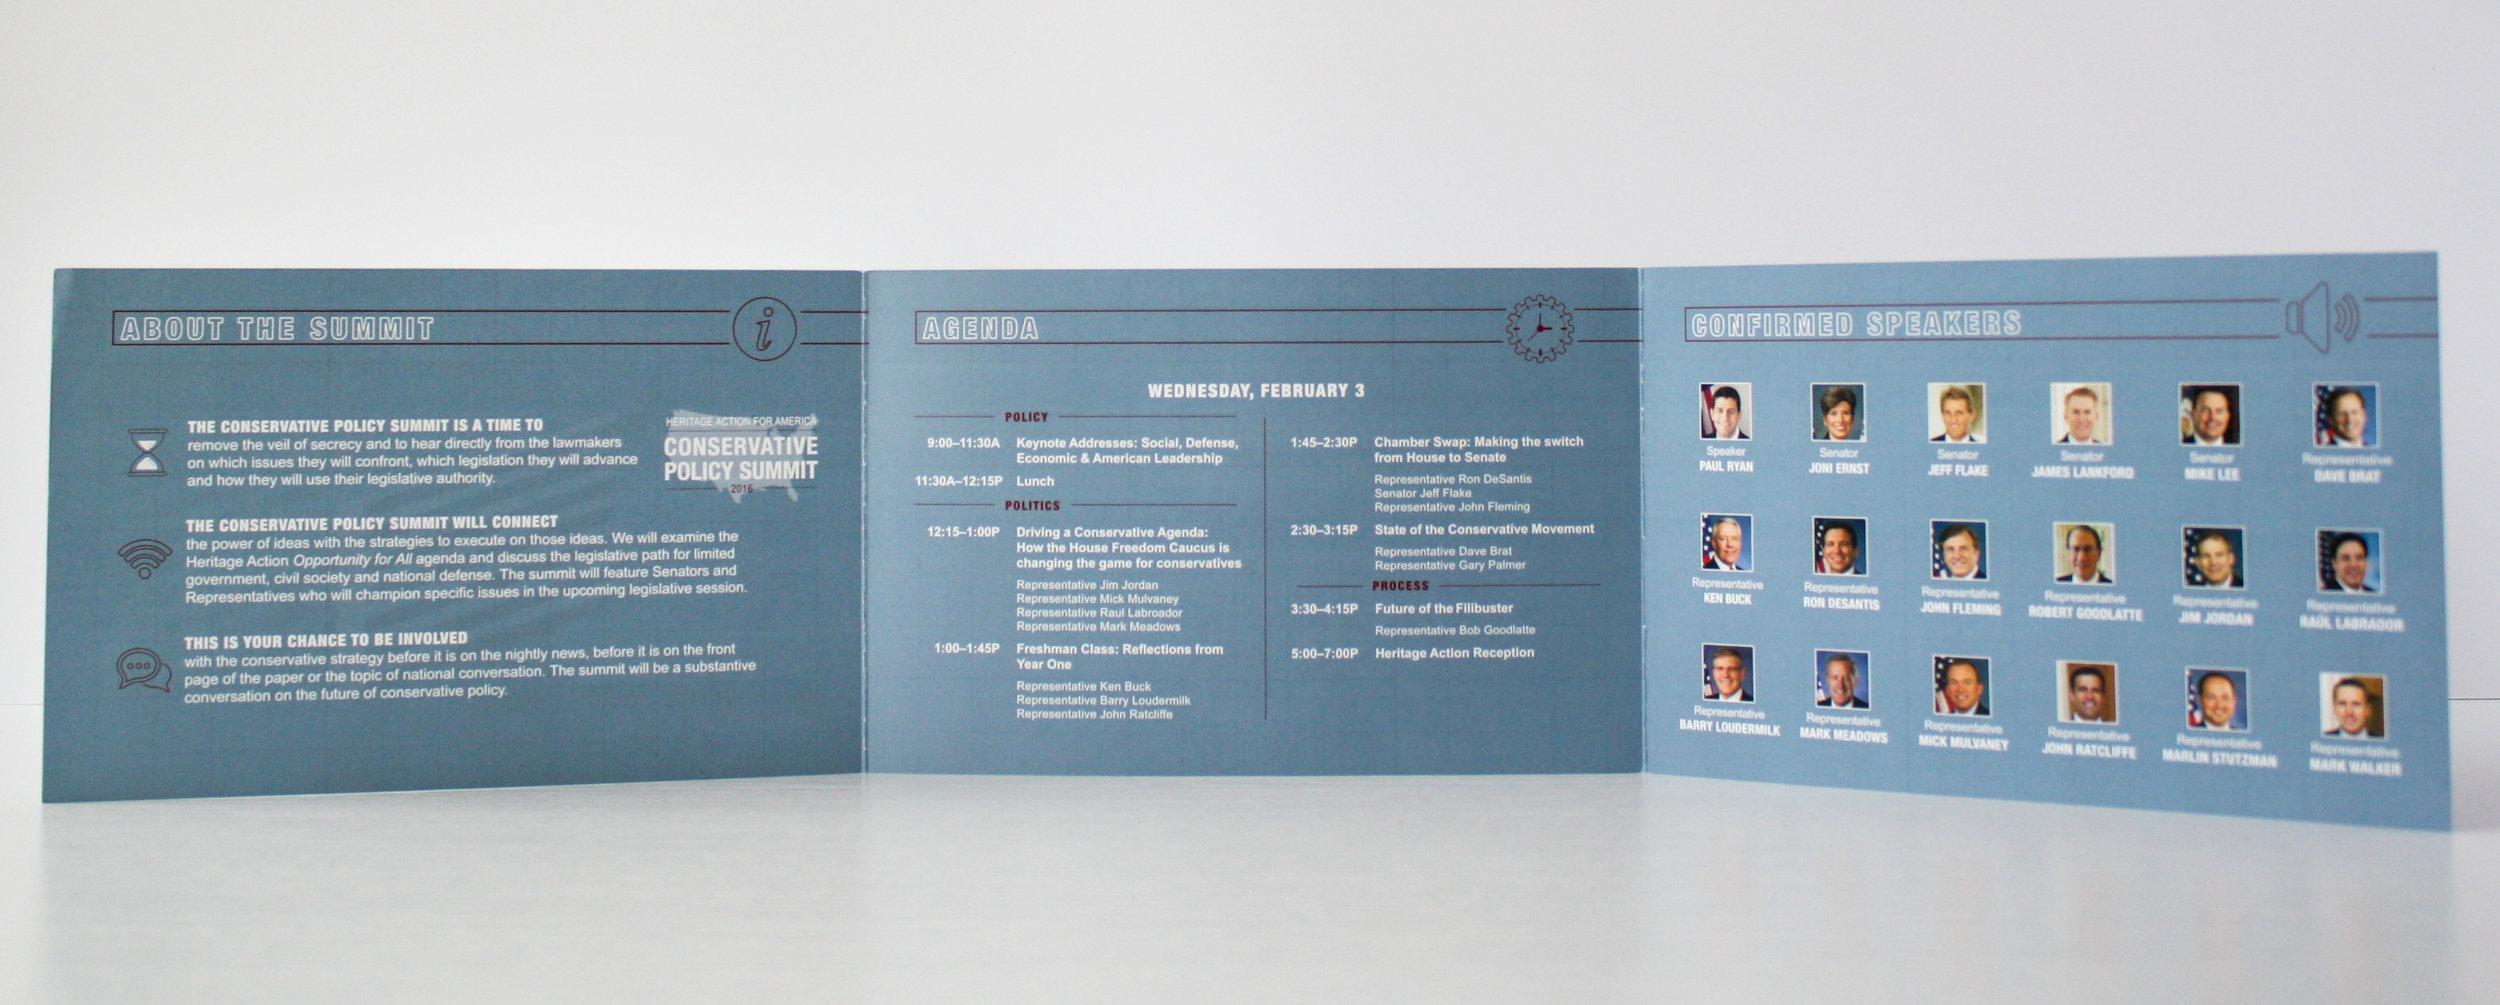 Conservative Policy Summit Corporate Event Invitation | Casi Long Design | casilong.com:portfolio | #casilongdesign #fearlesspursuit 4.jpg